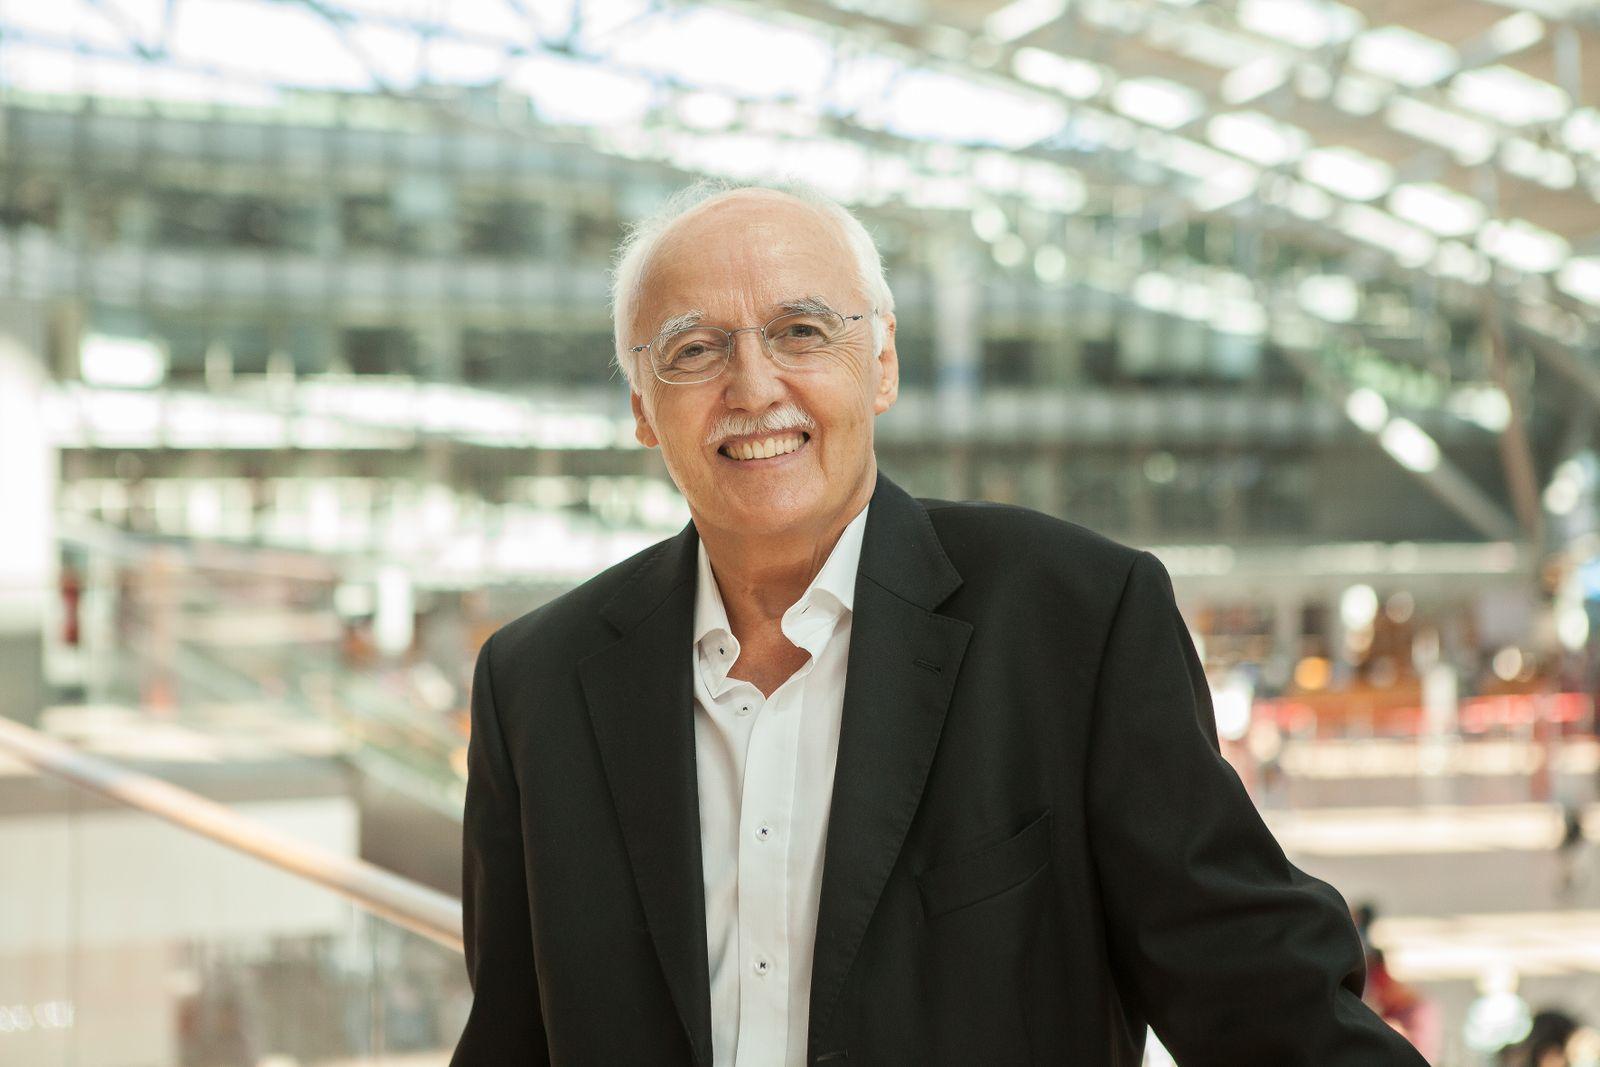 Prof. Dr. Horst Opaschowski